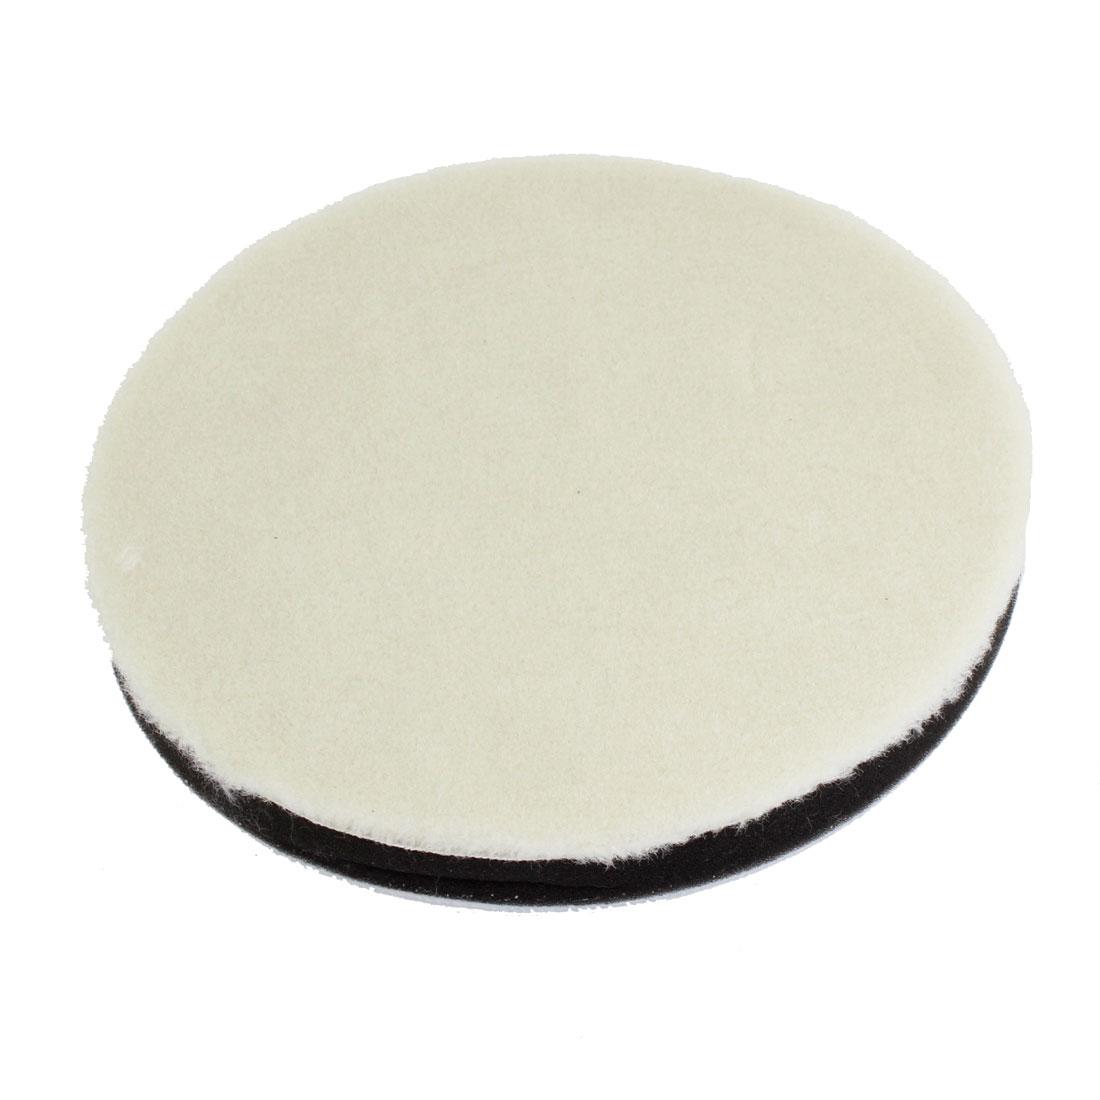 "White Faux Wool 7.3"" Dia Round Polishing Pad Wheel for Car"